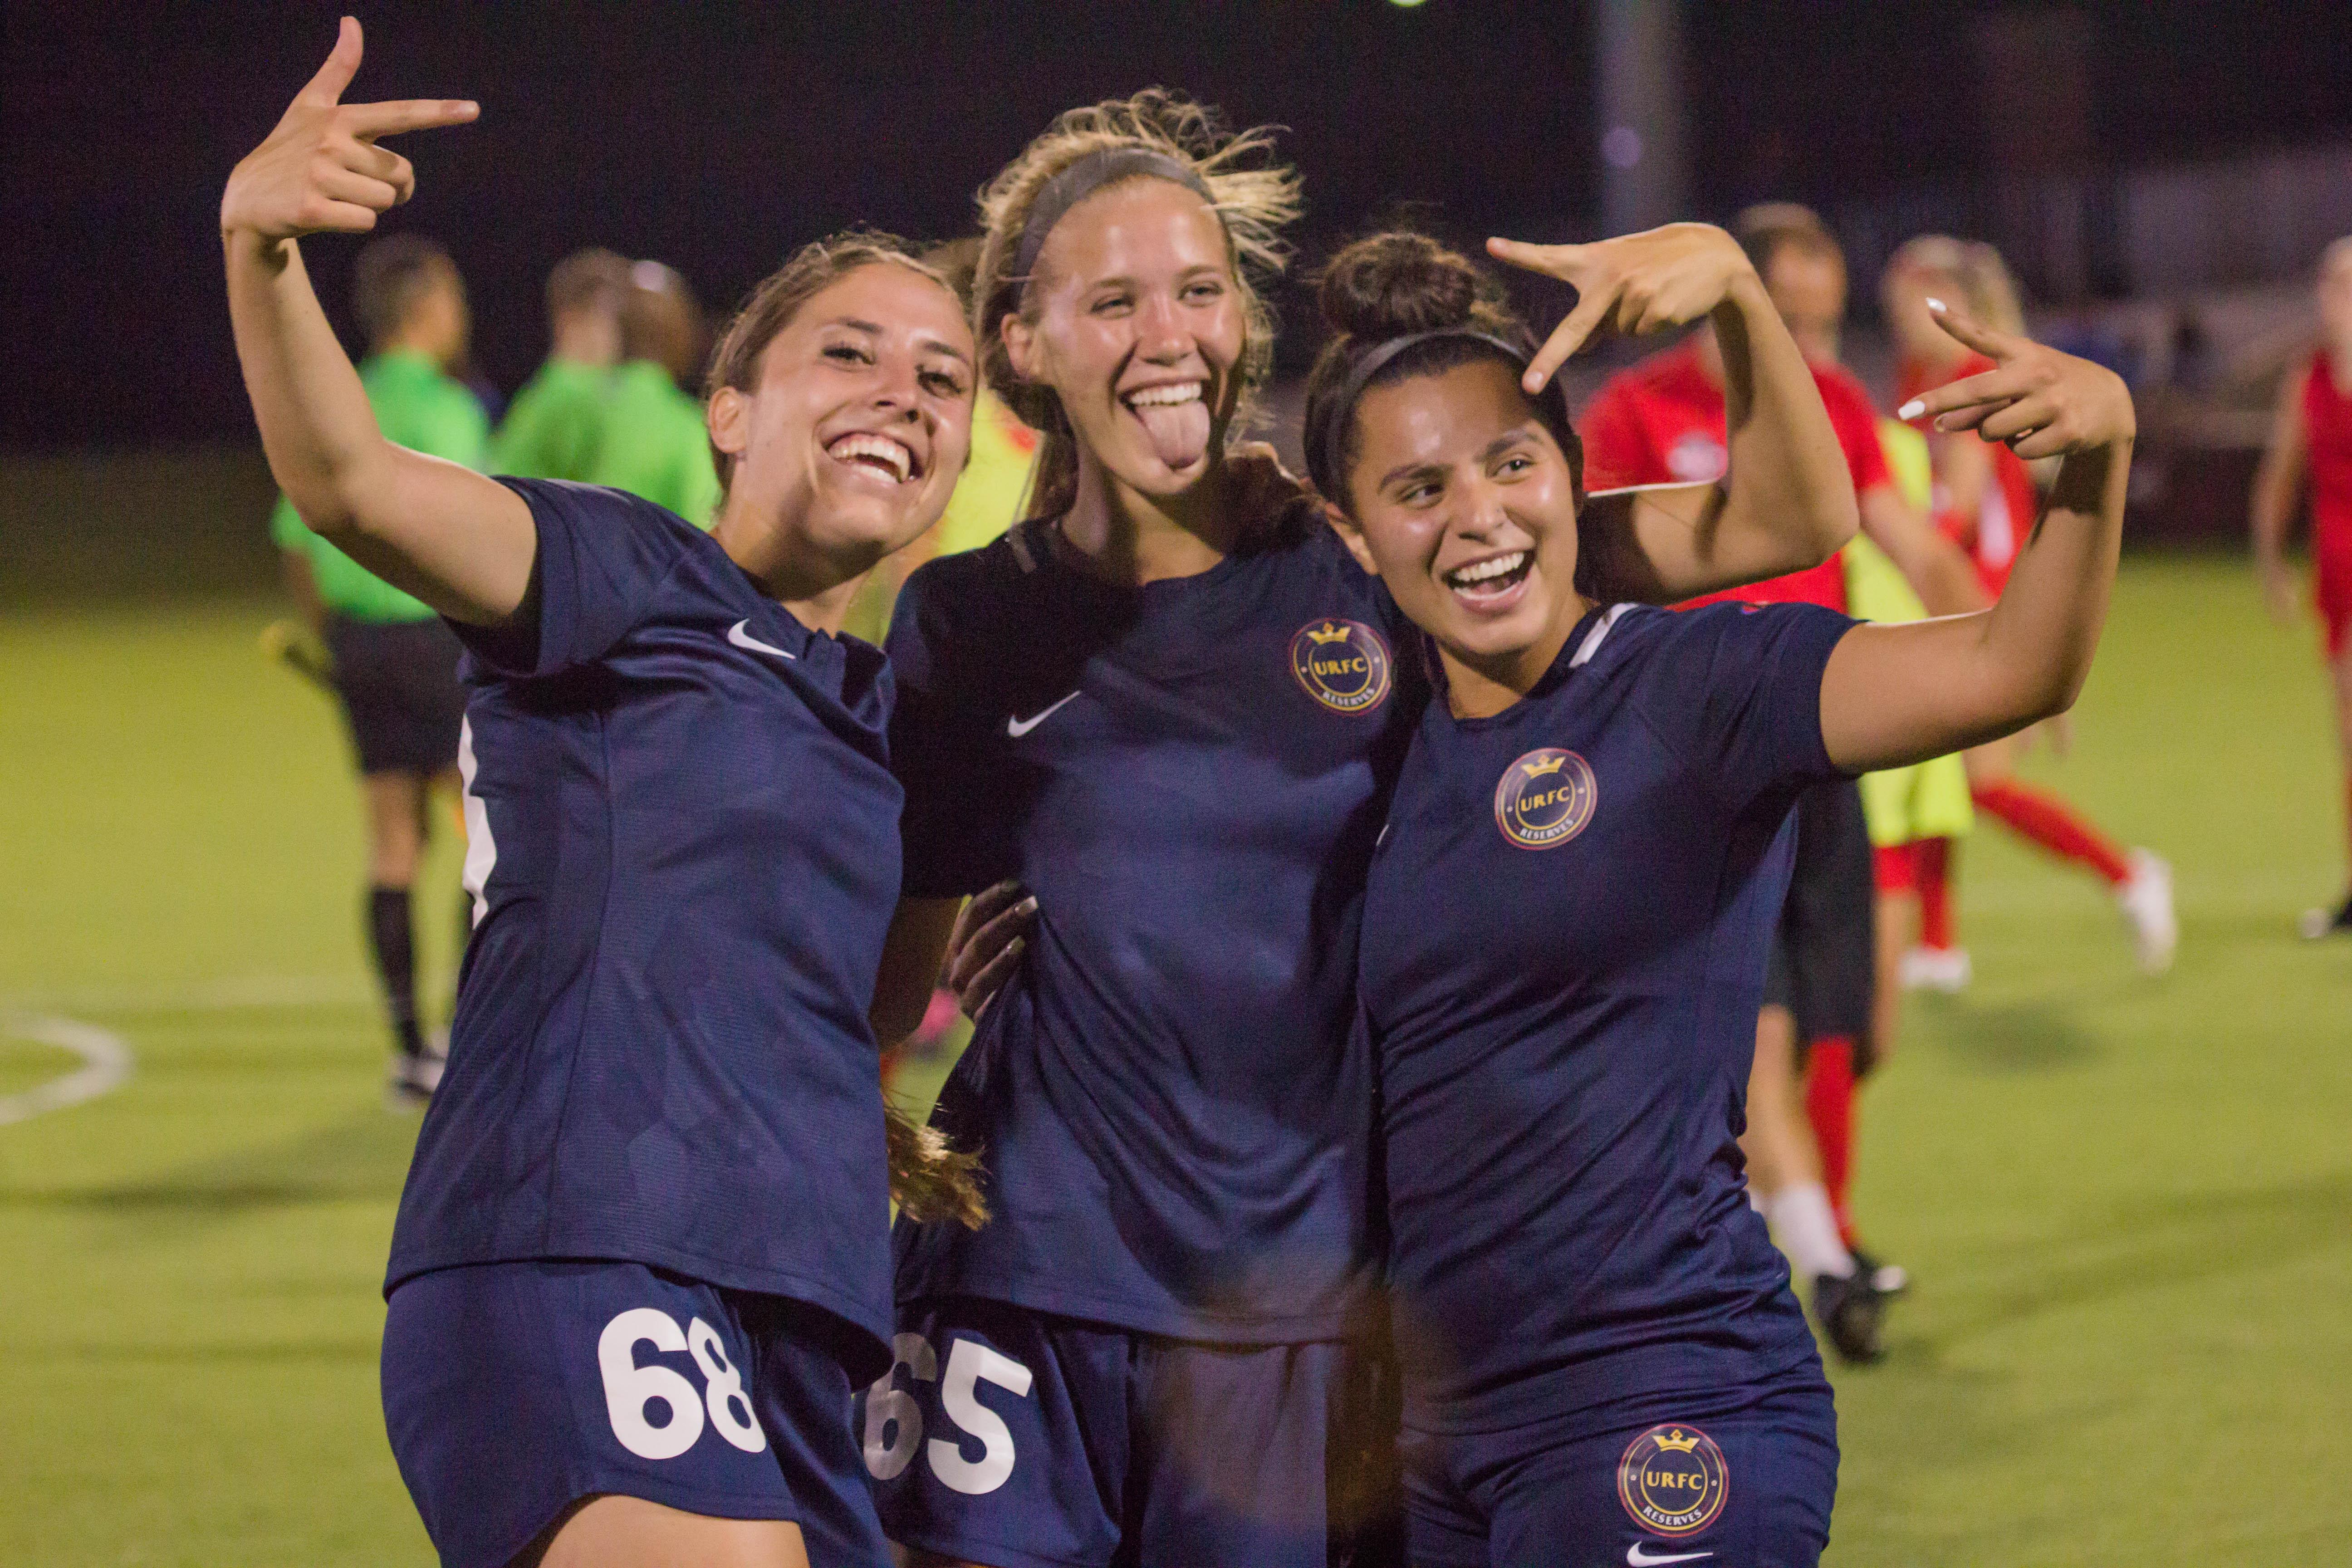 Women's Premier Soccer League